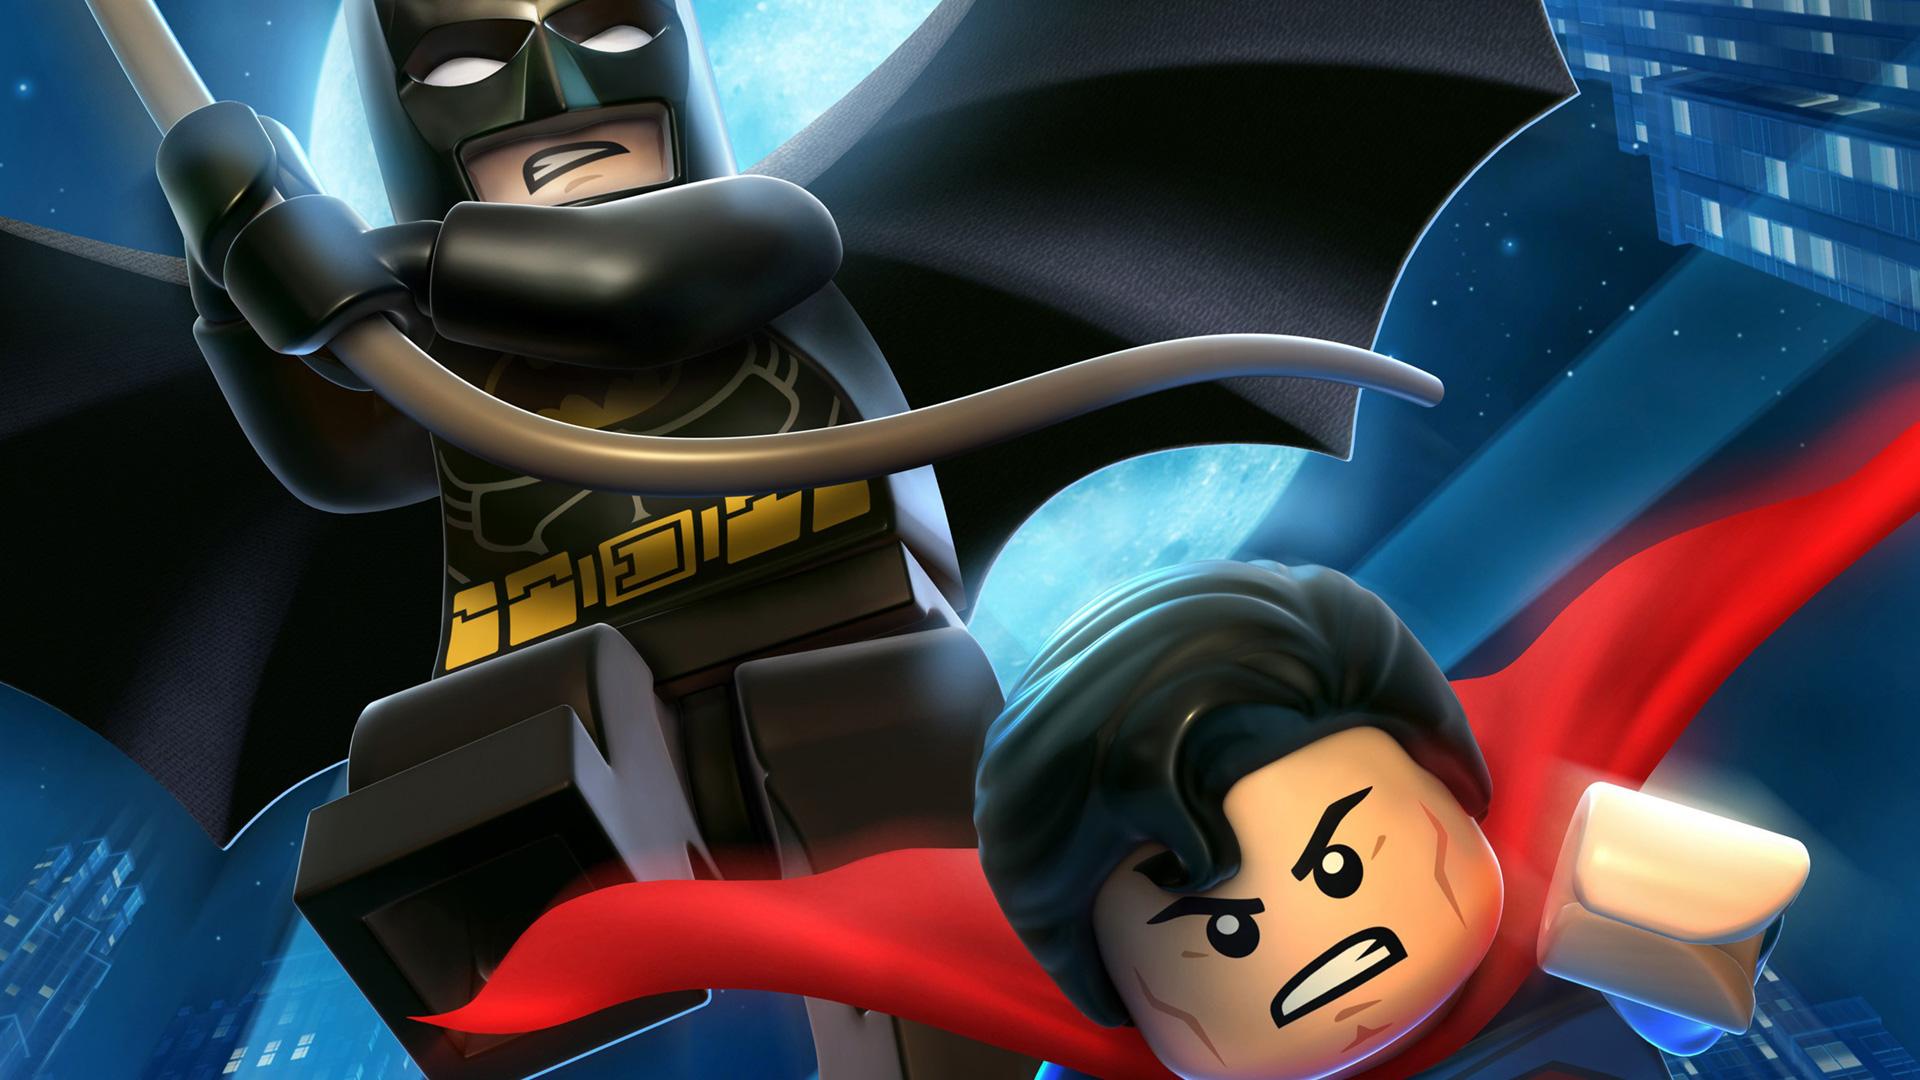 Free Lego Batman 2: DC Super Heroes Wallpaper in 1920x1080